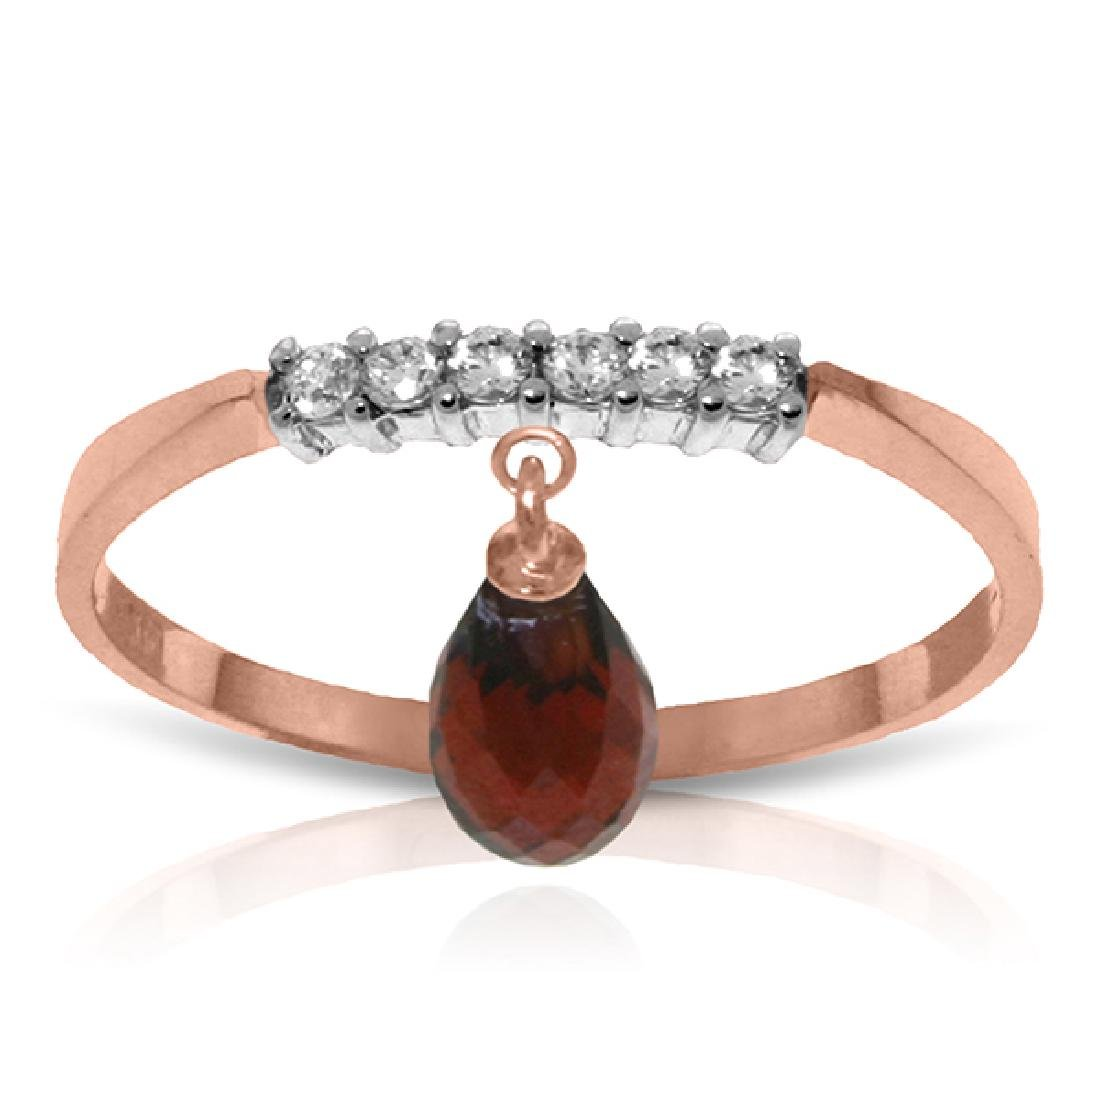 Genuine 1.45 ctw Garnet & Diamond Ring Jewelry 14KT